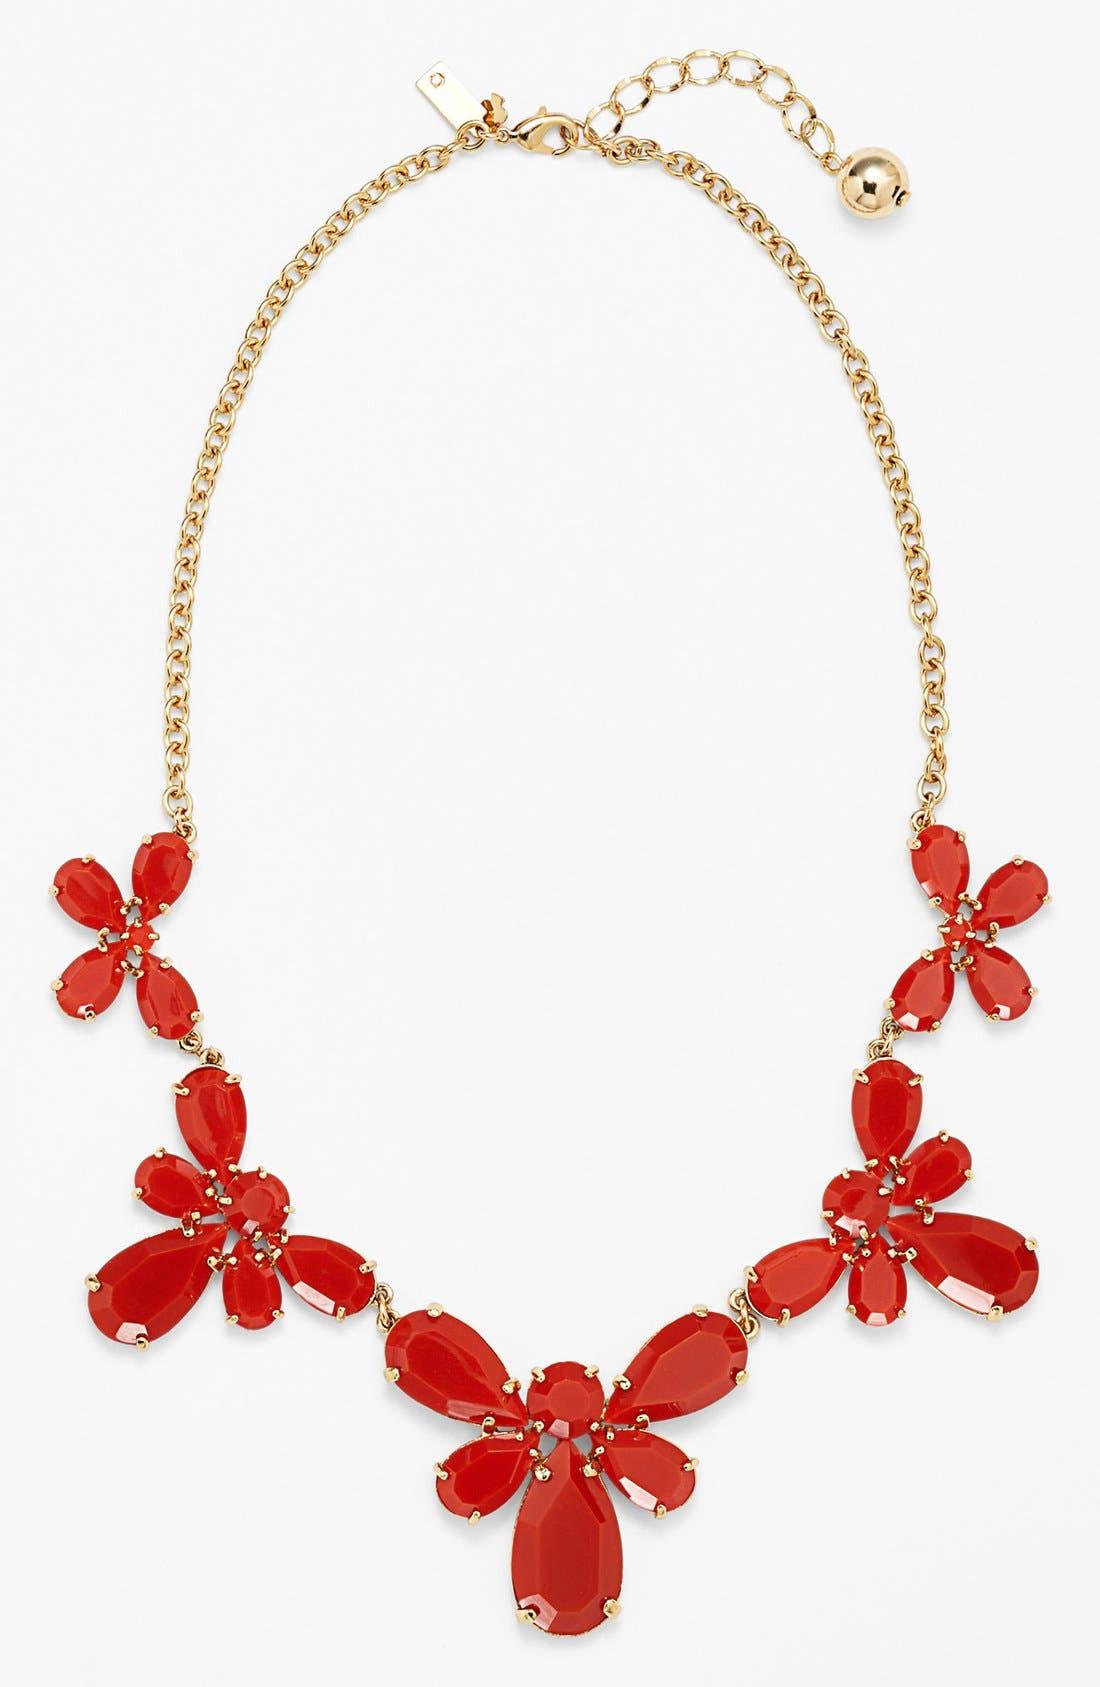 Alternate Image 1 Selected - kate spade new york 'garden path' graduated collar necklace